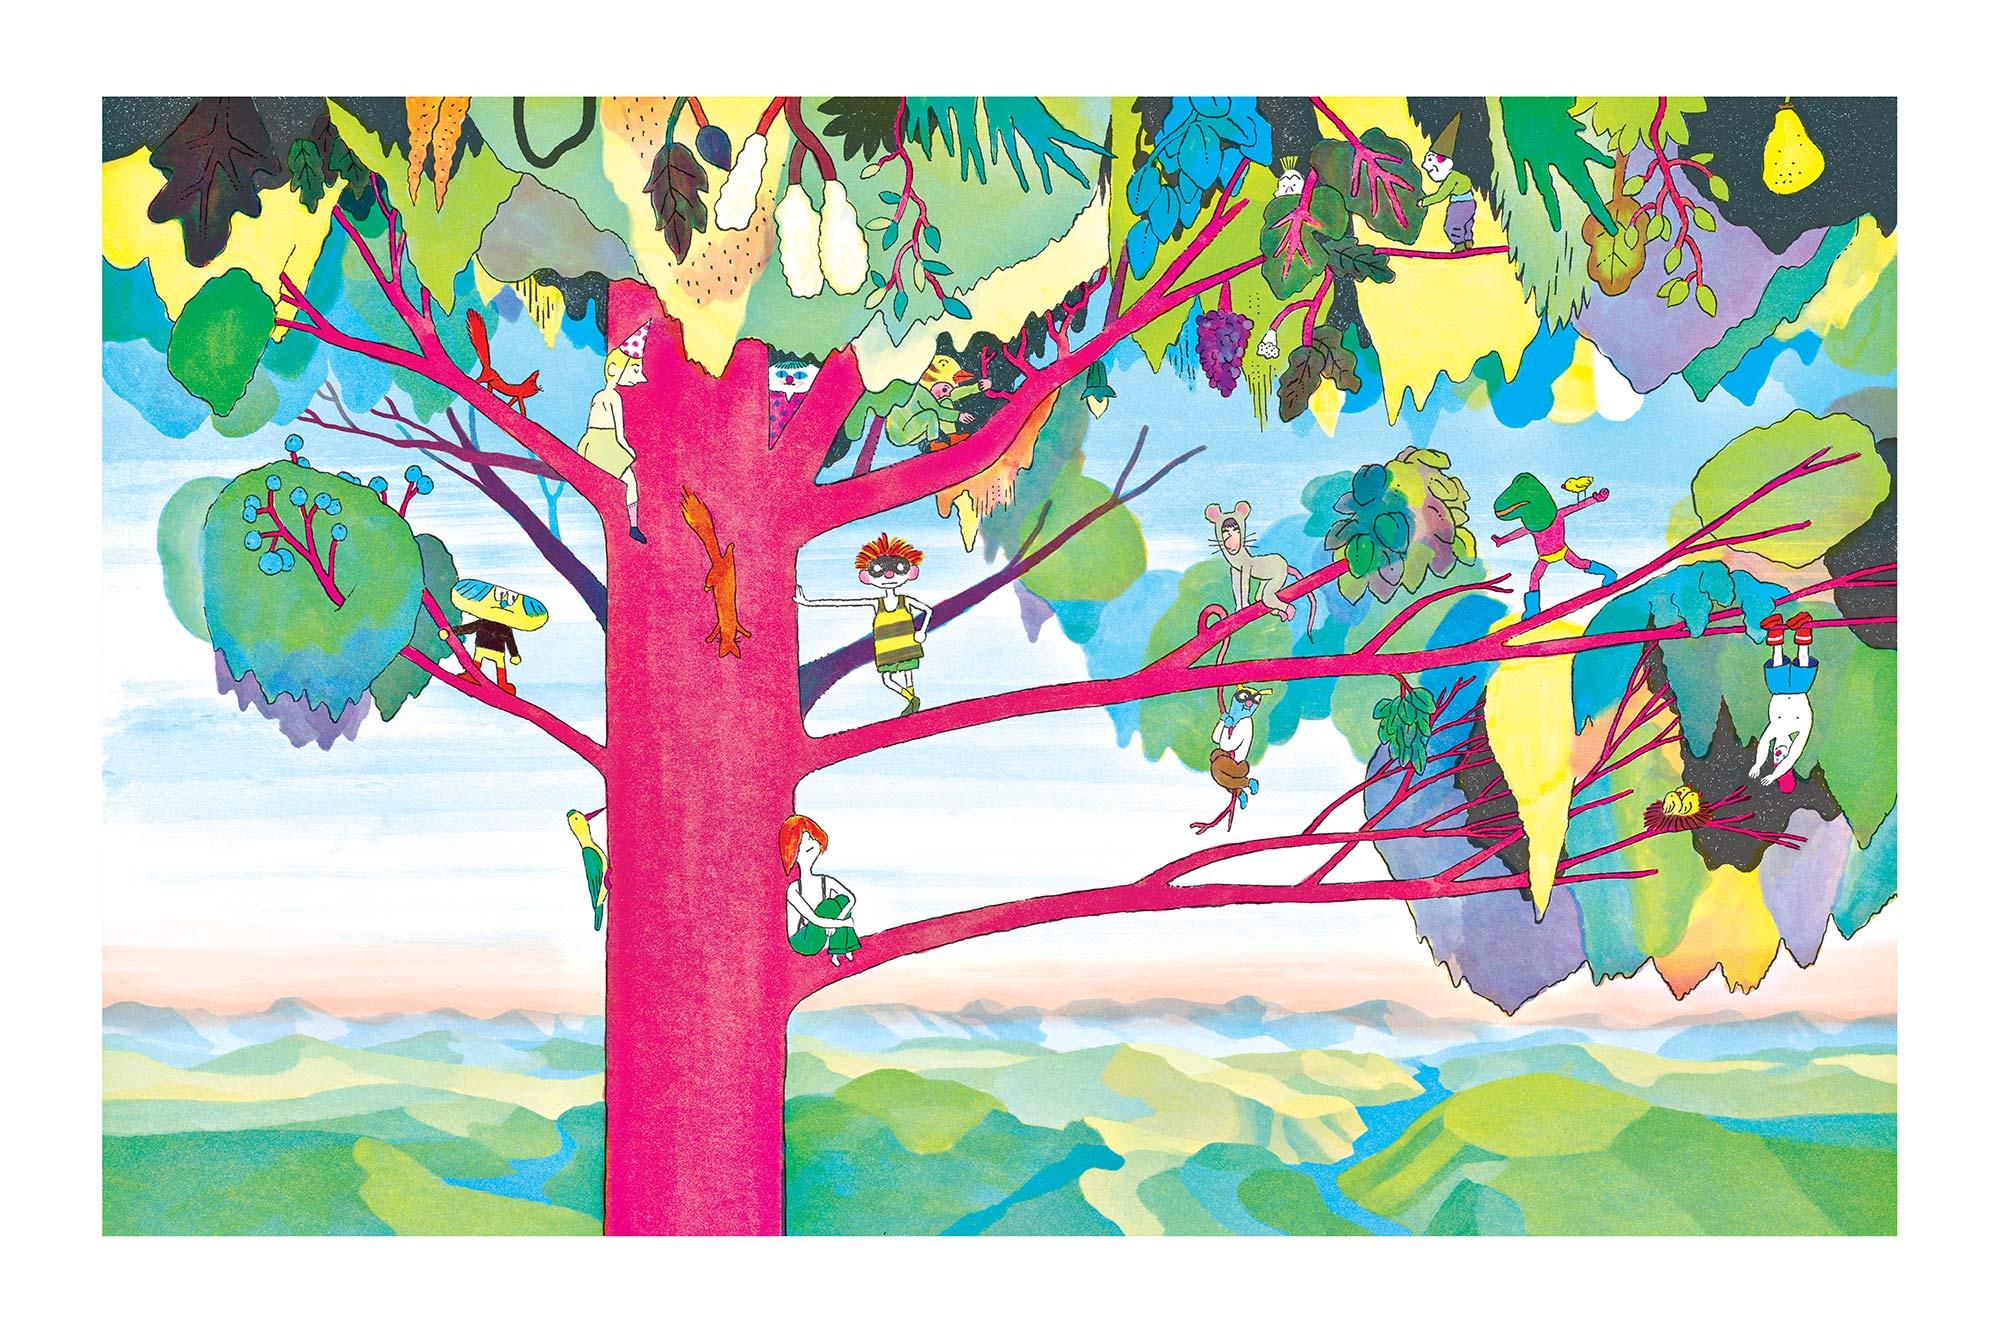 VINCENT PIANINA - L'arbre | GALERIE TREIZE-DIX - VINCENT PIANINA | VINCENT PIANINA - L'arbre